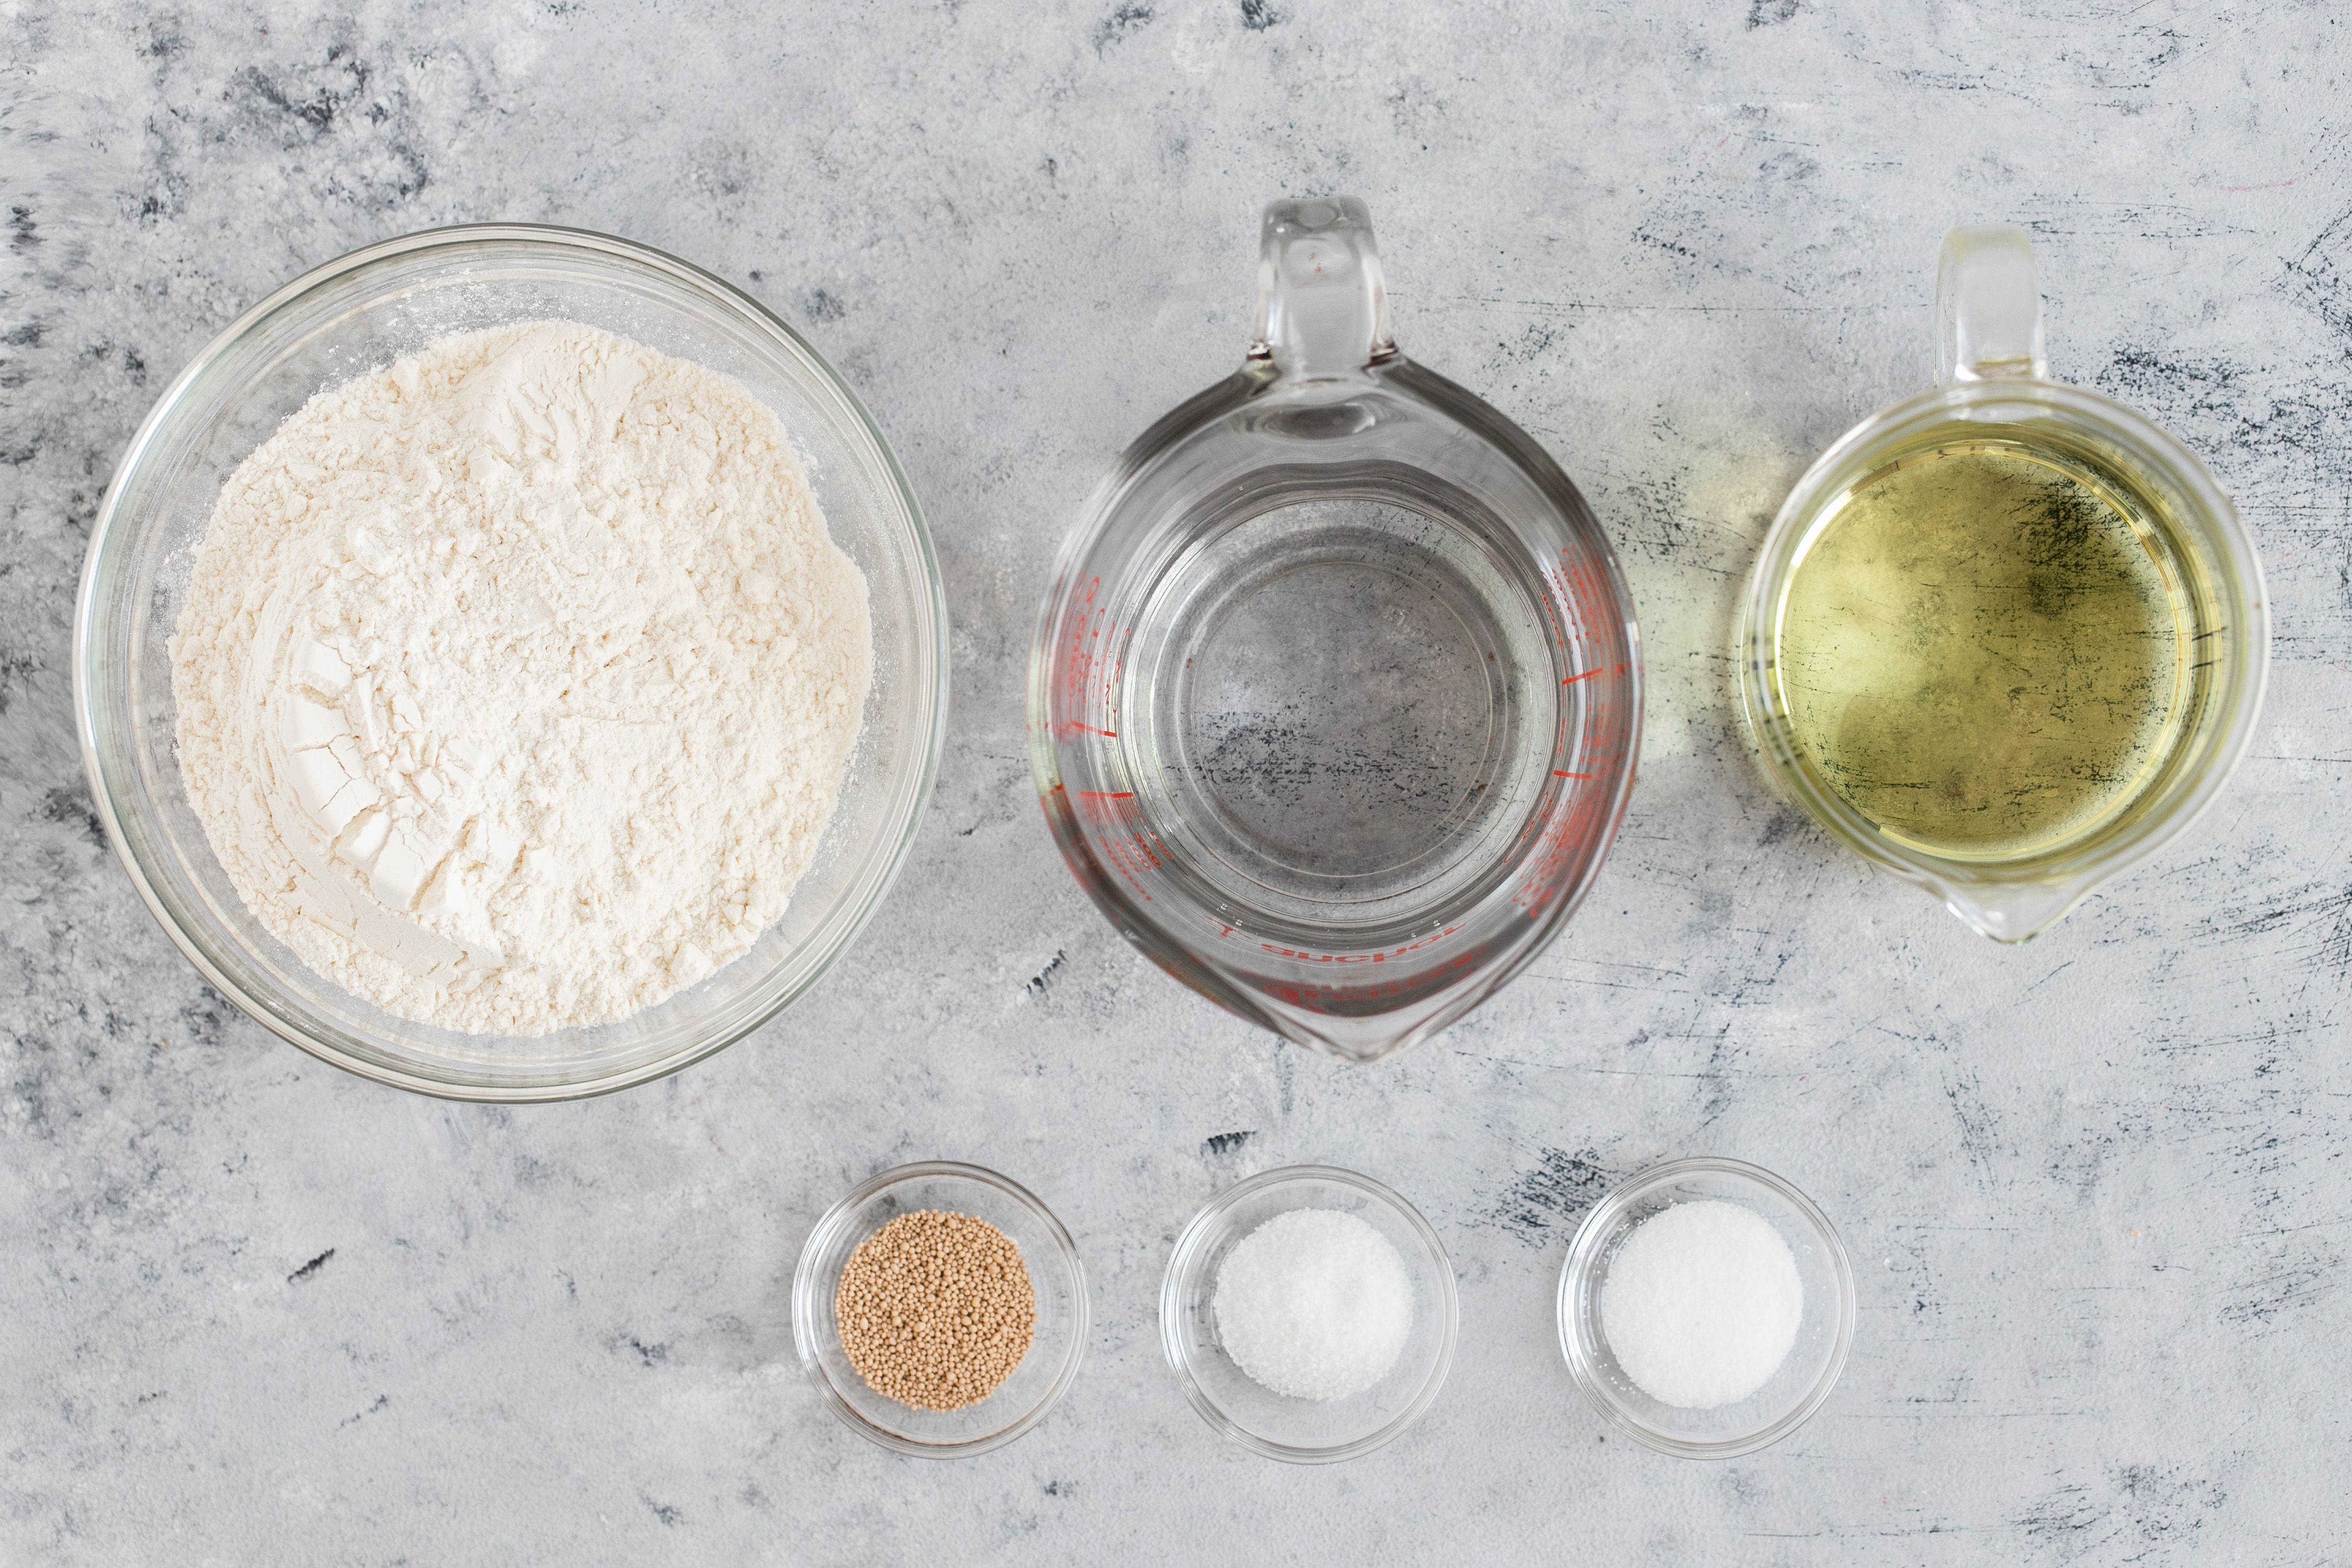 Ingredients for lokma